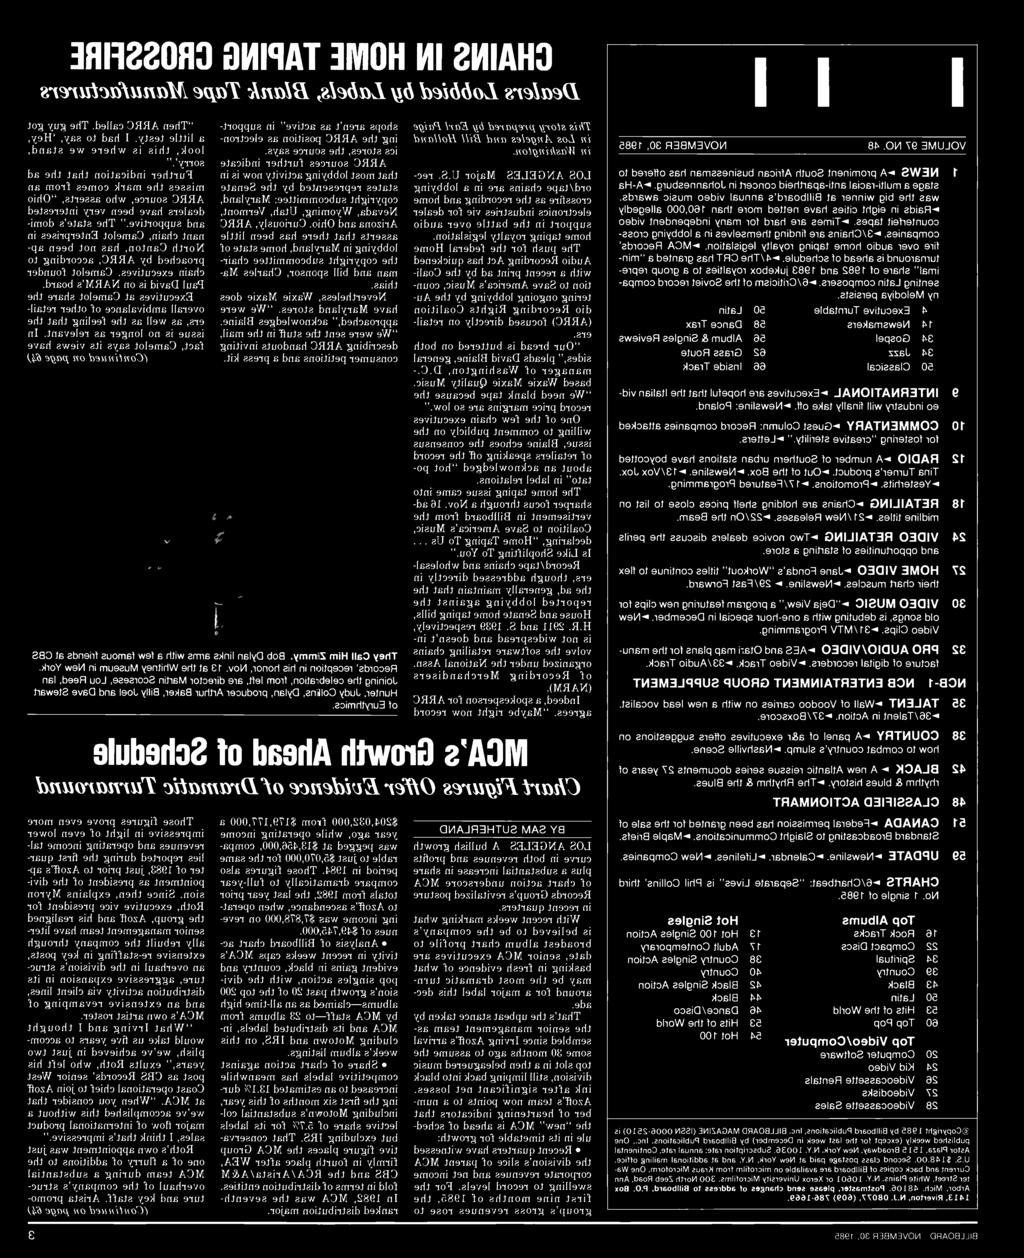 Mar86. S+ob07 Anti Apartheid Aid? S (View 13 of 20)